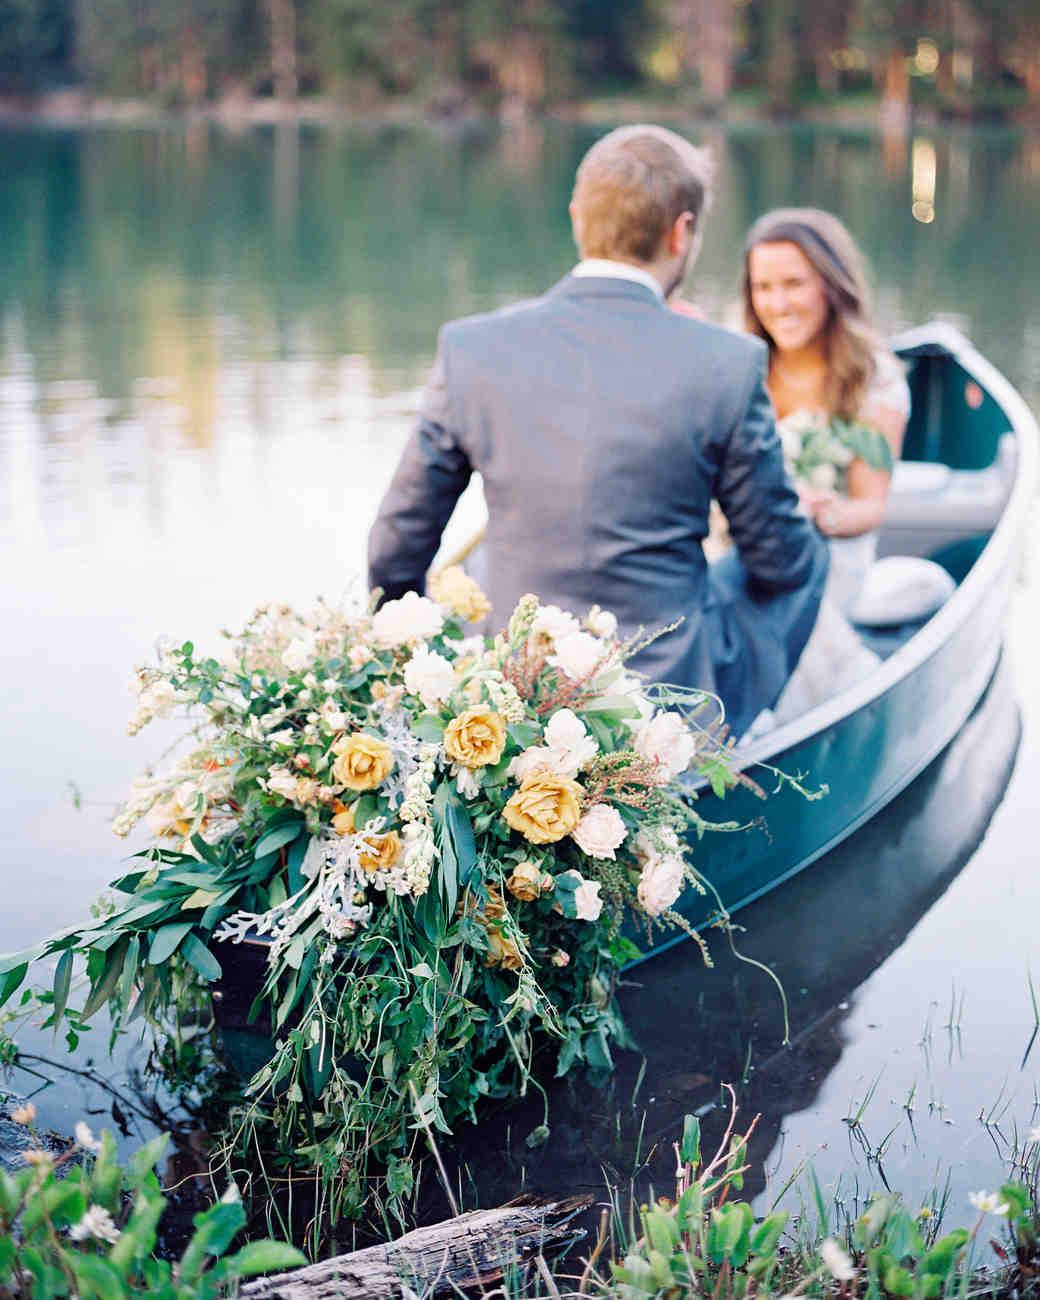 mckenzie-brandon-wedding-canoe-104-s112364-1115.jpg